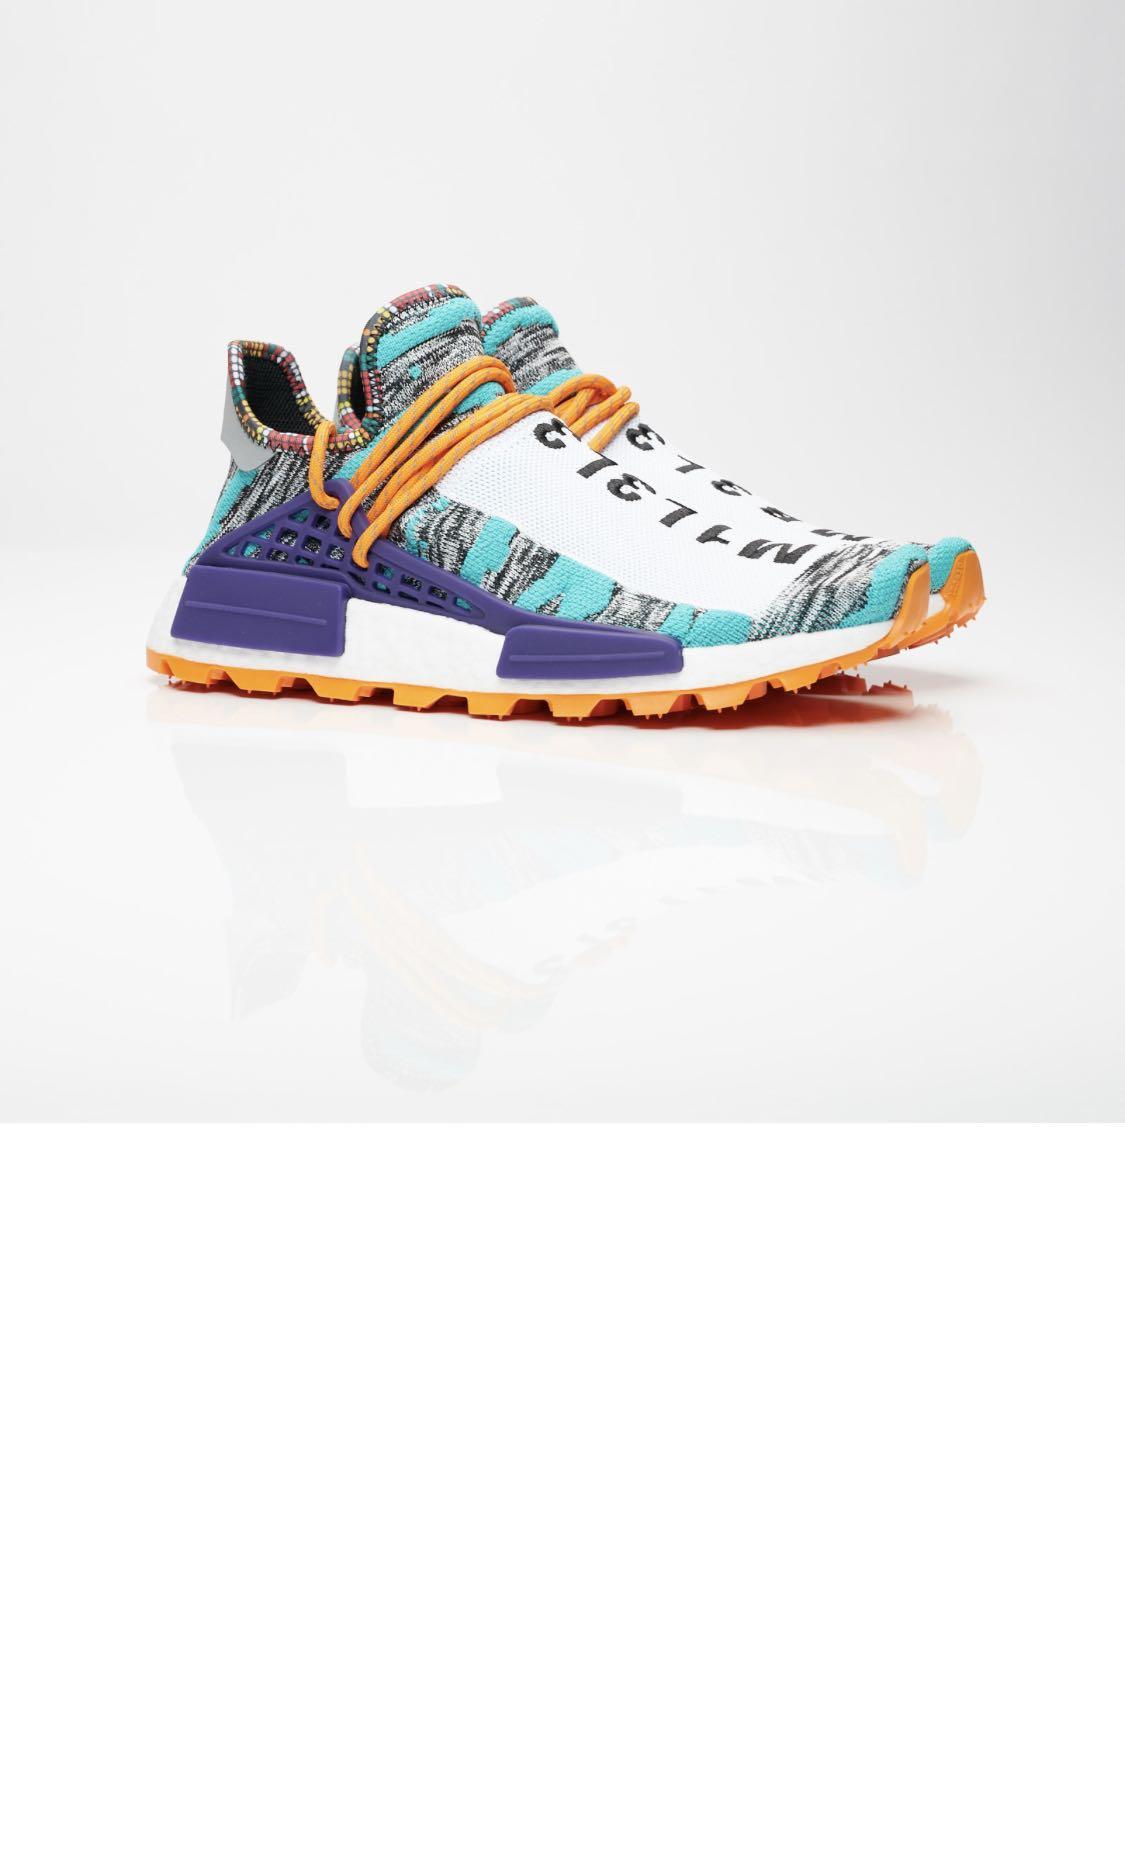 f4a13d31a346c Adidas Solar HU NMD x Pharrell Williams